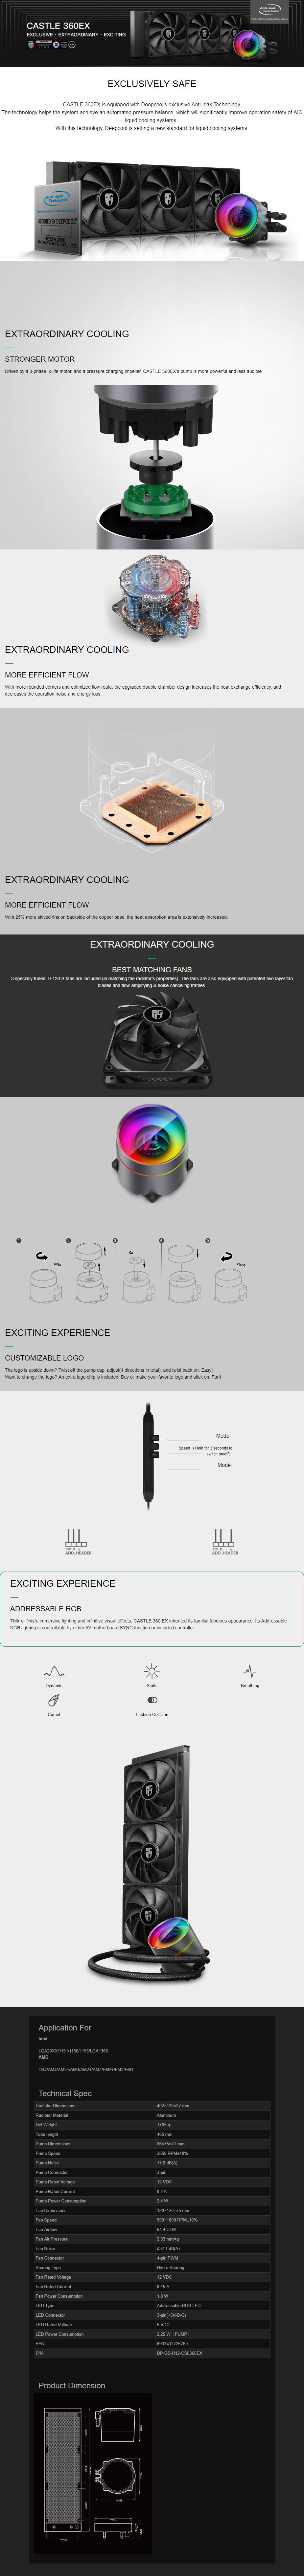 deepcool-gamer-storm-castle-360ex-rgb-aio-cpu-liquid-cooler-ac26544-8.jpg